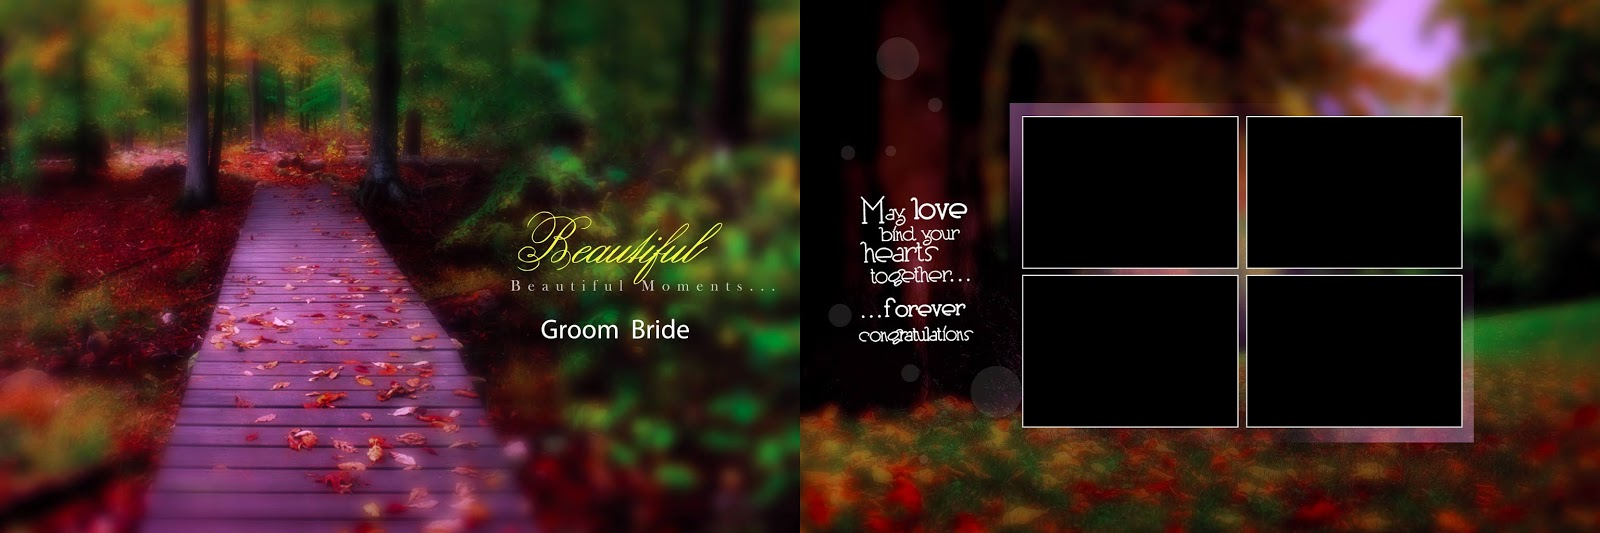 Creative Wedding Album Background 2019 12x36 Psd File Vol 4